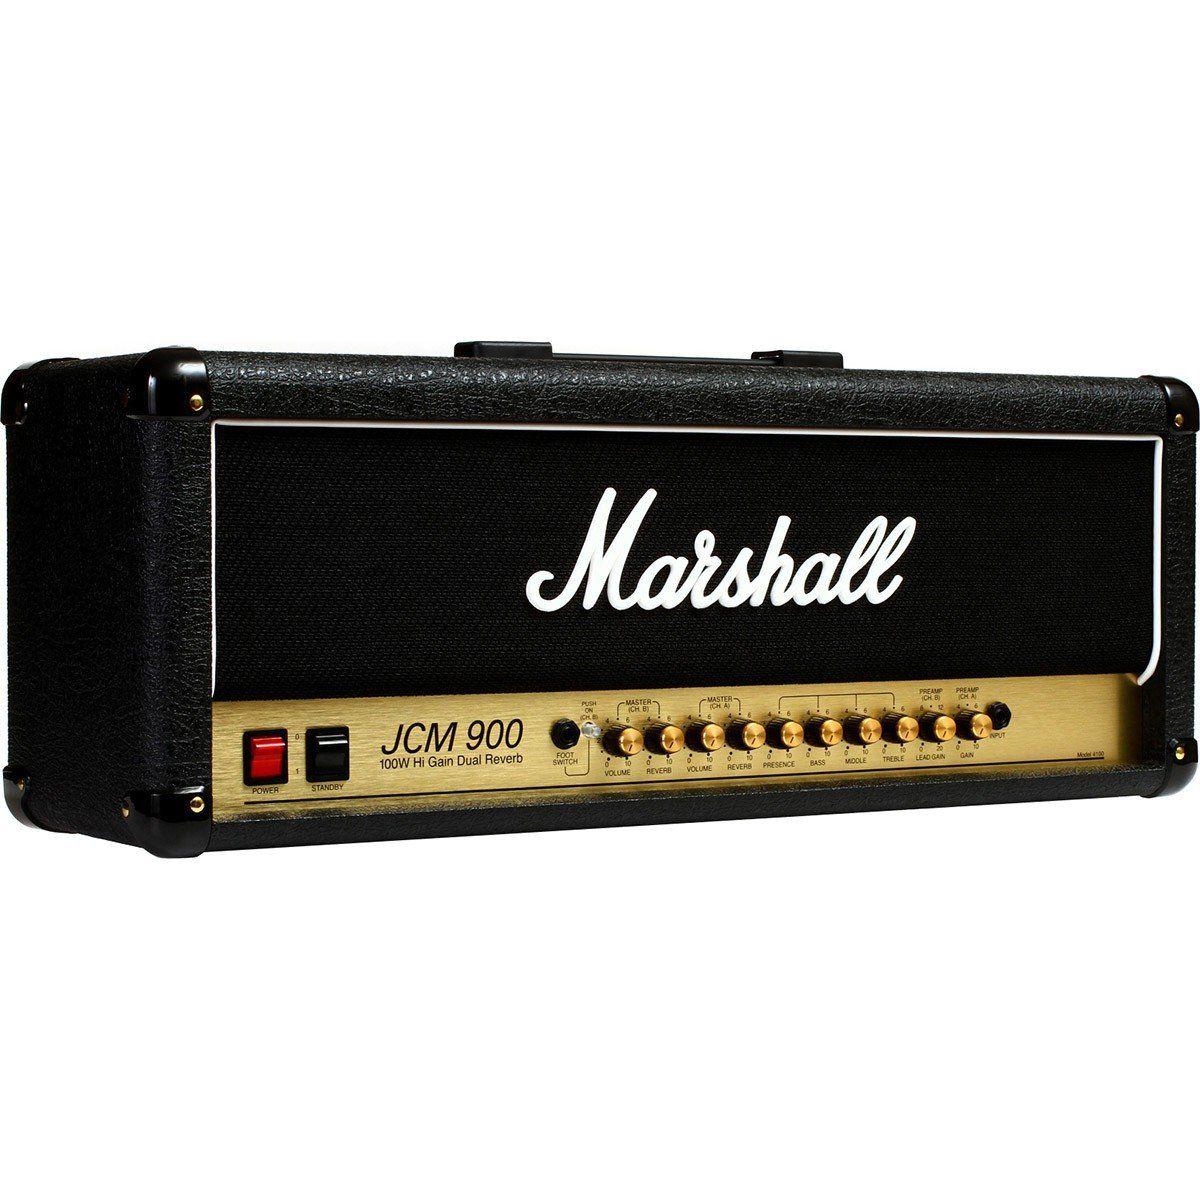 Marshall JCM900 Amplificador Cabeçote para Guitarra